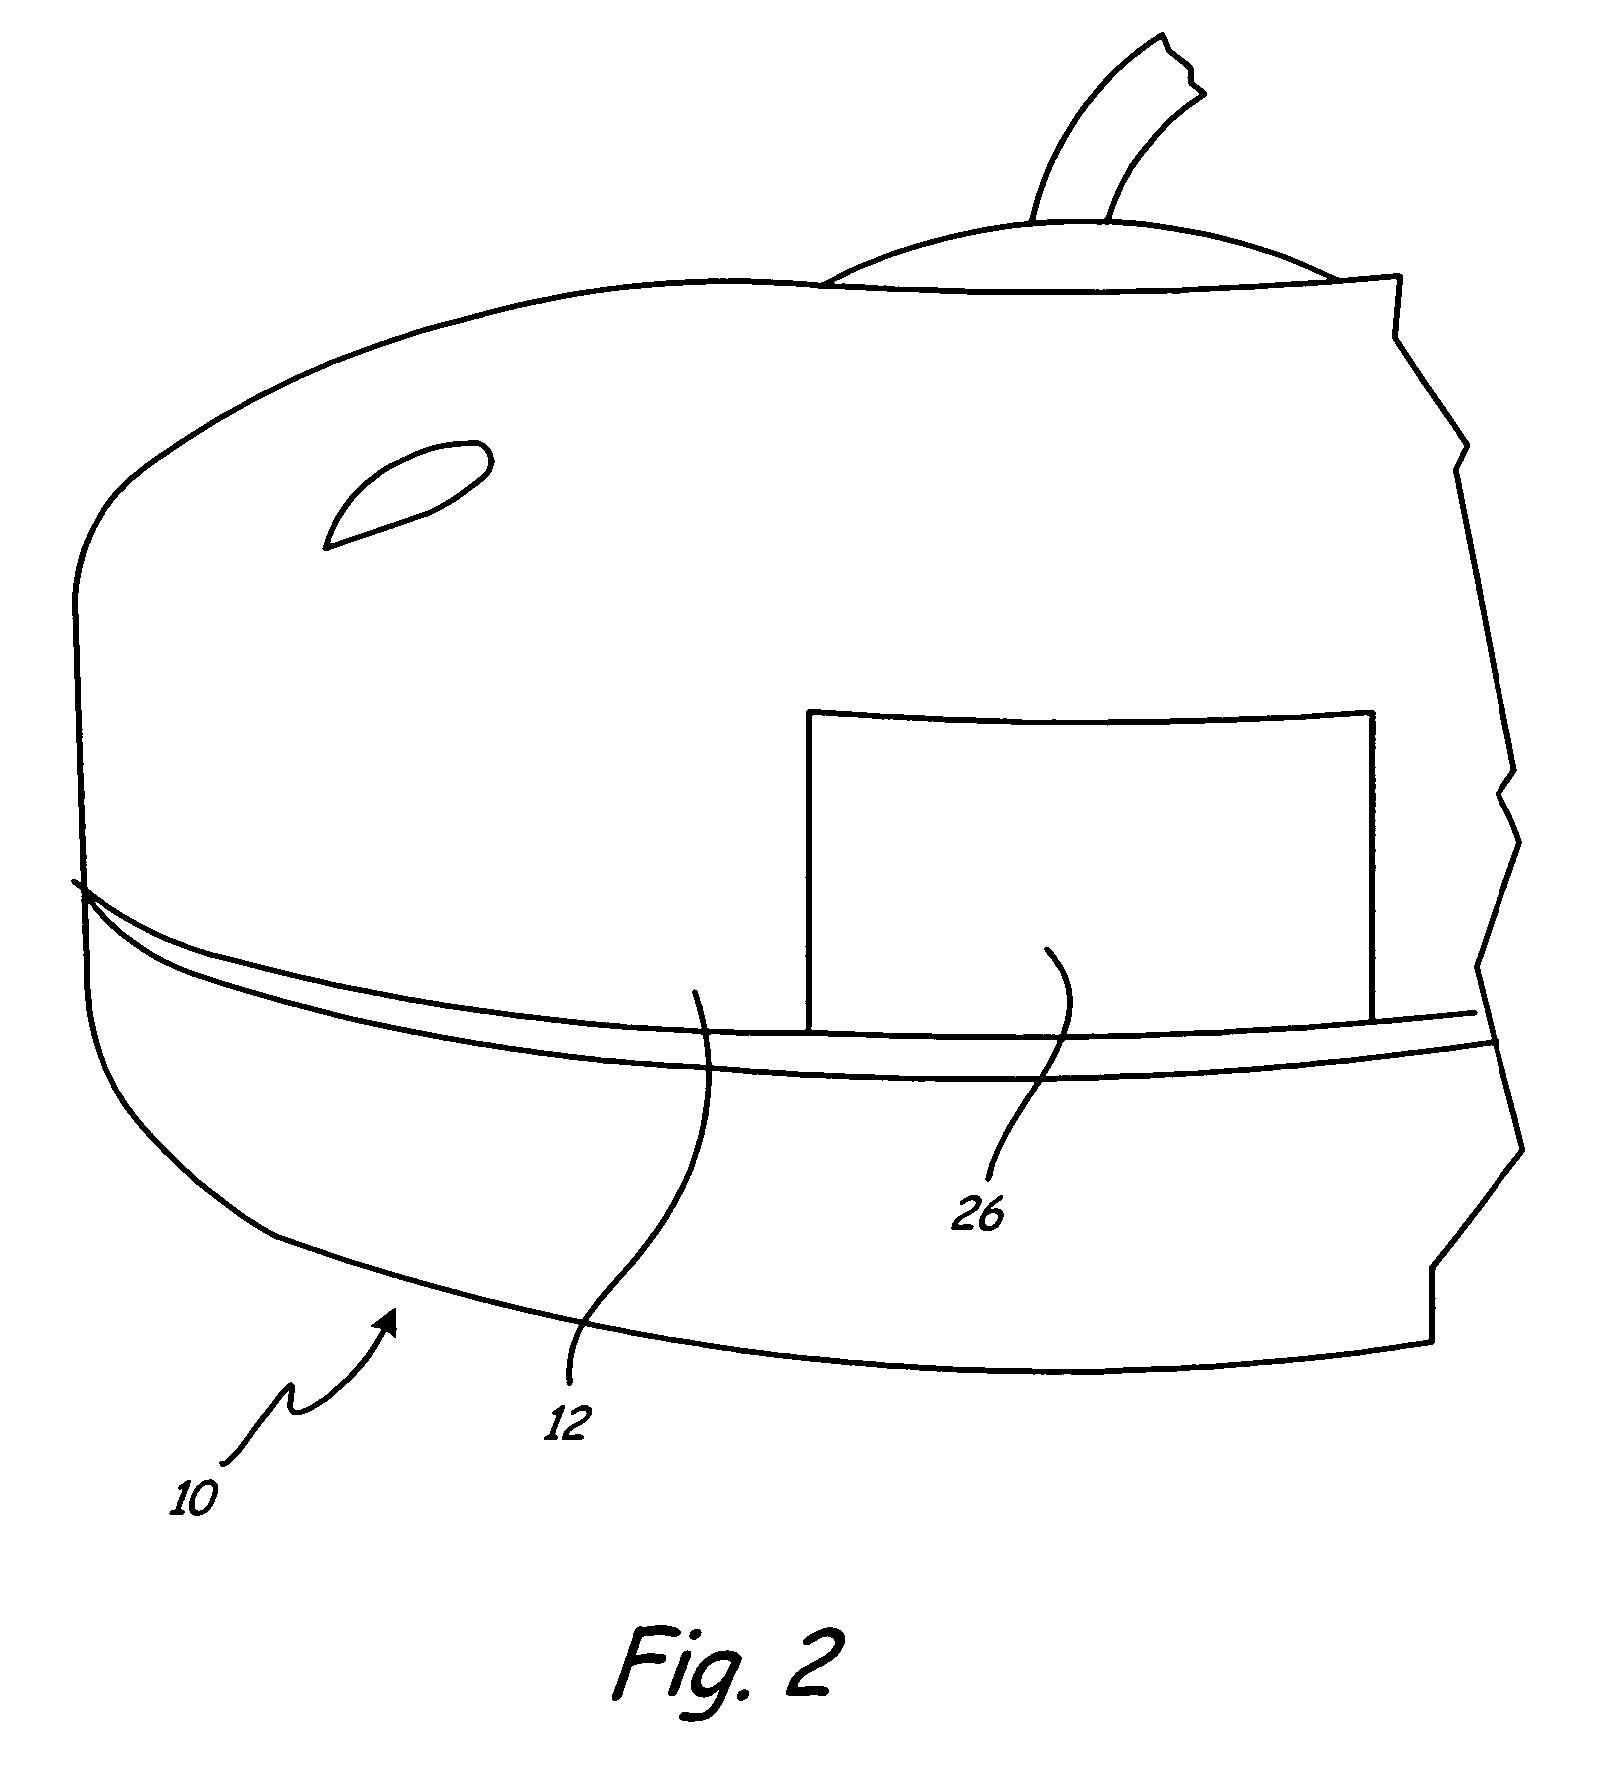 Curbell Pillow Speaker Wiring Diagram : 37 Wiring Diagram